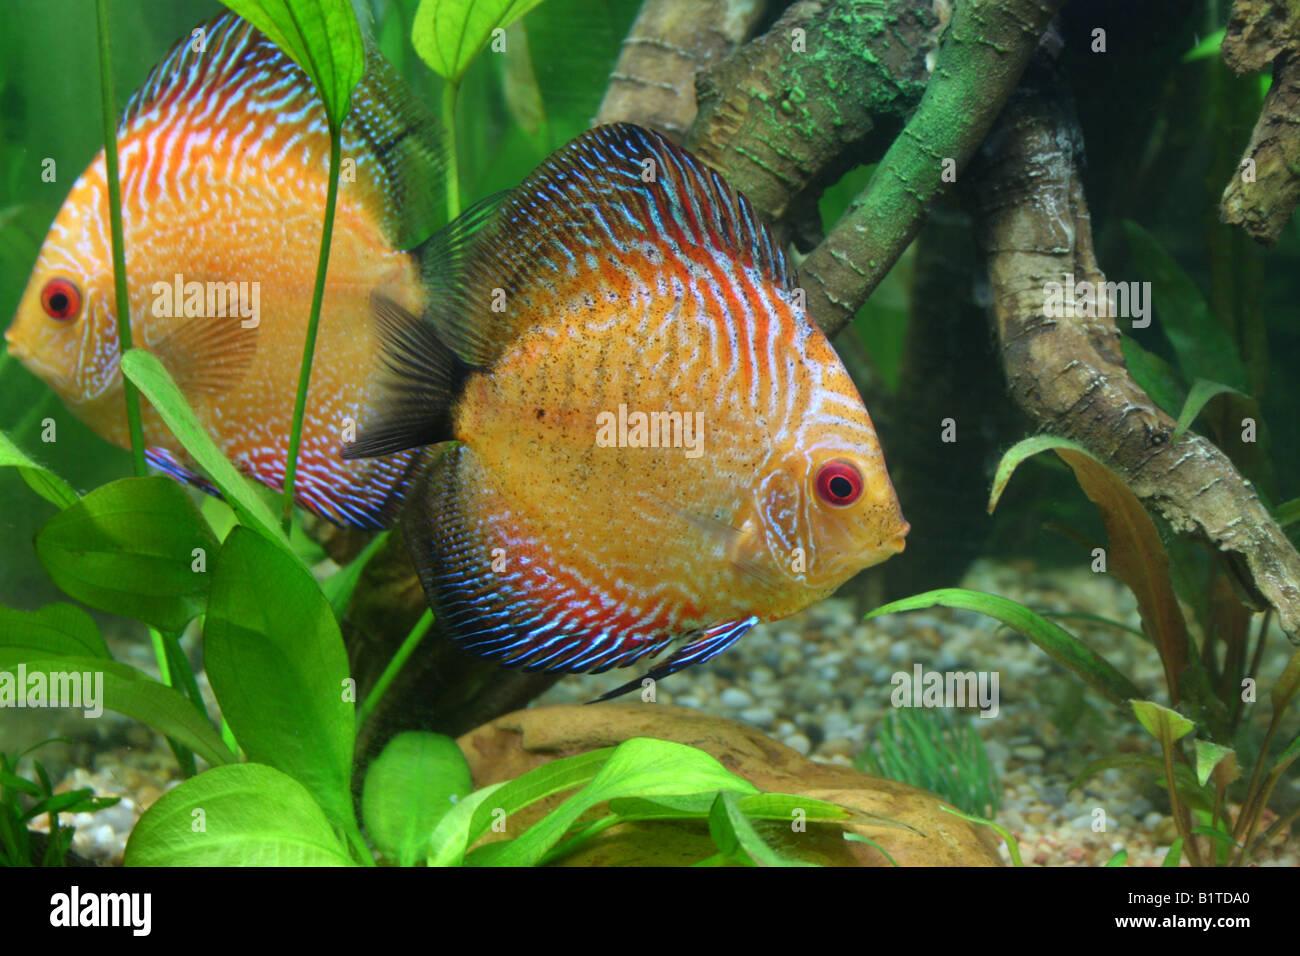 Pigeon Snake Discus Fish In A Tropical Aquarium Stock Photo